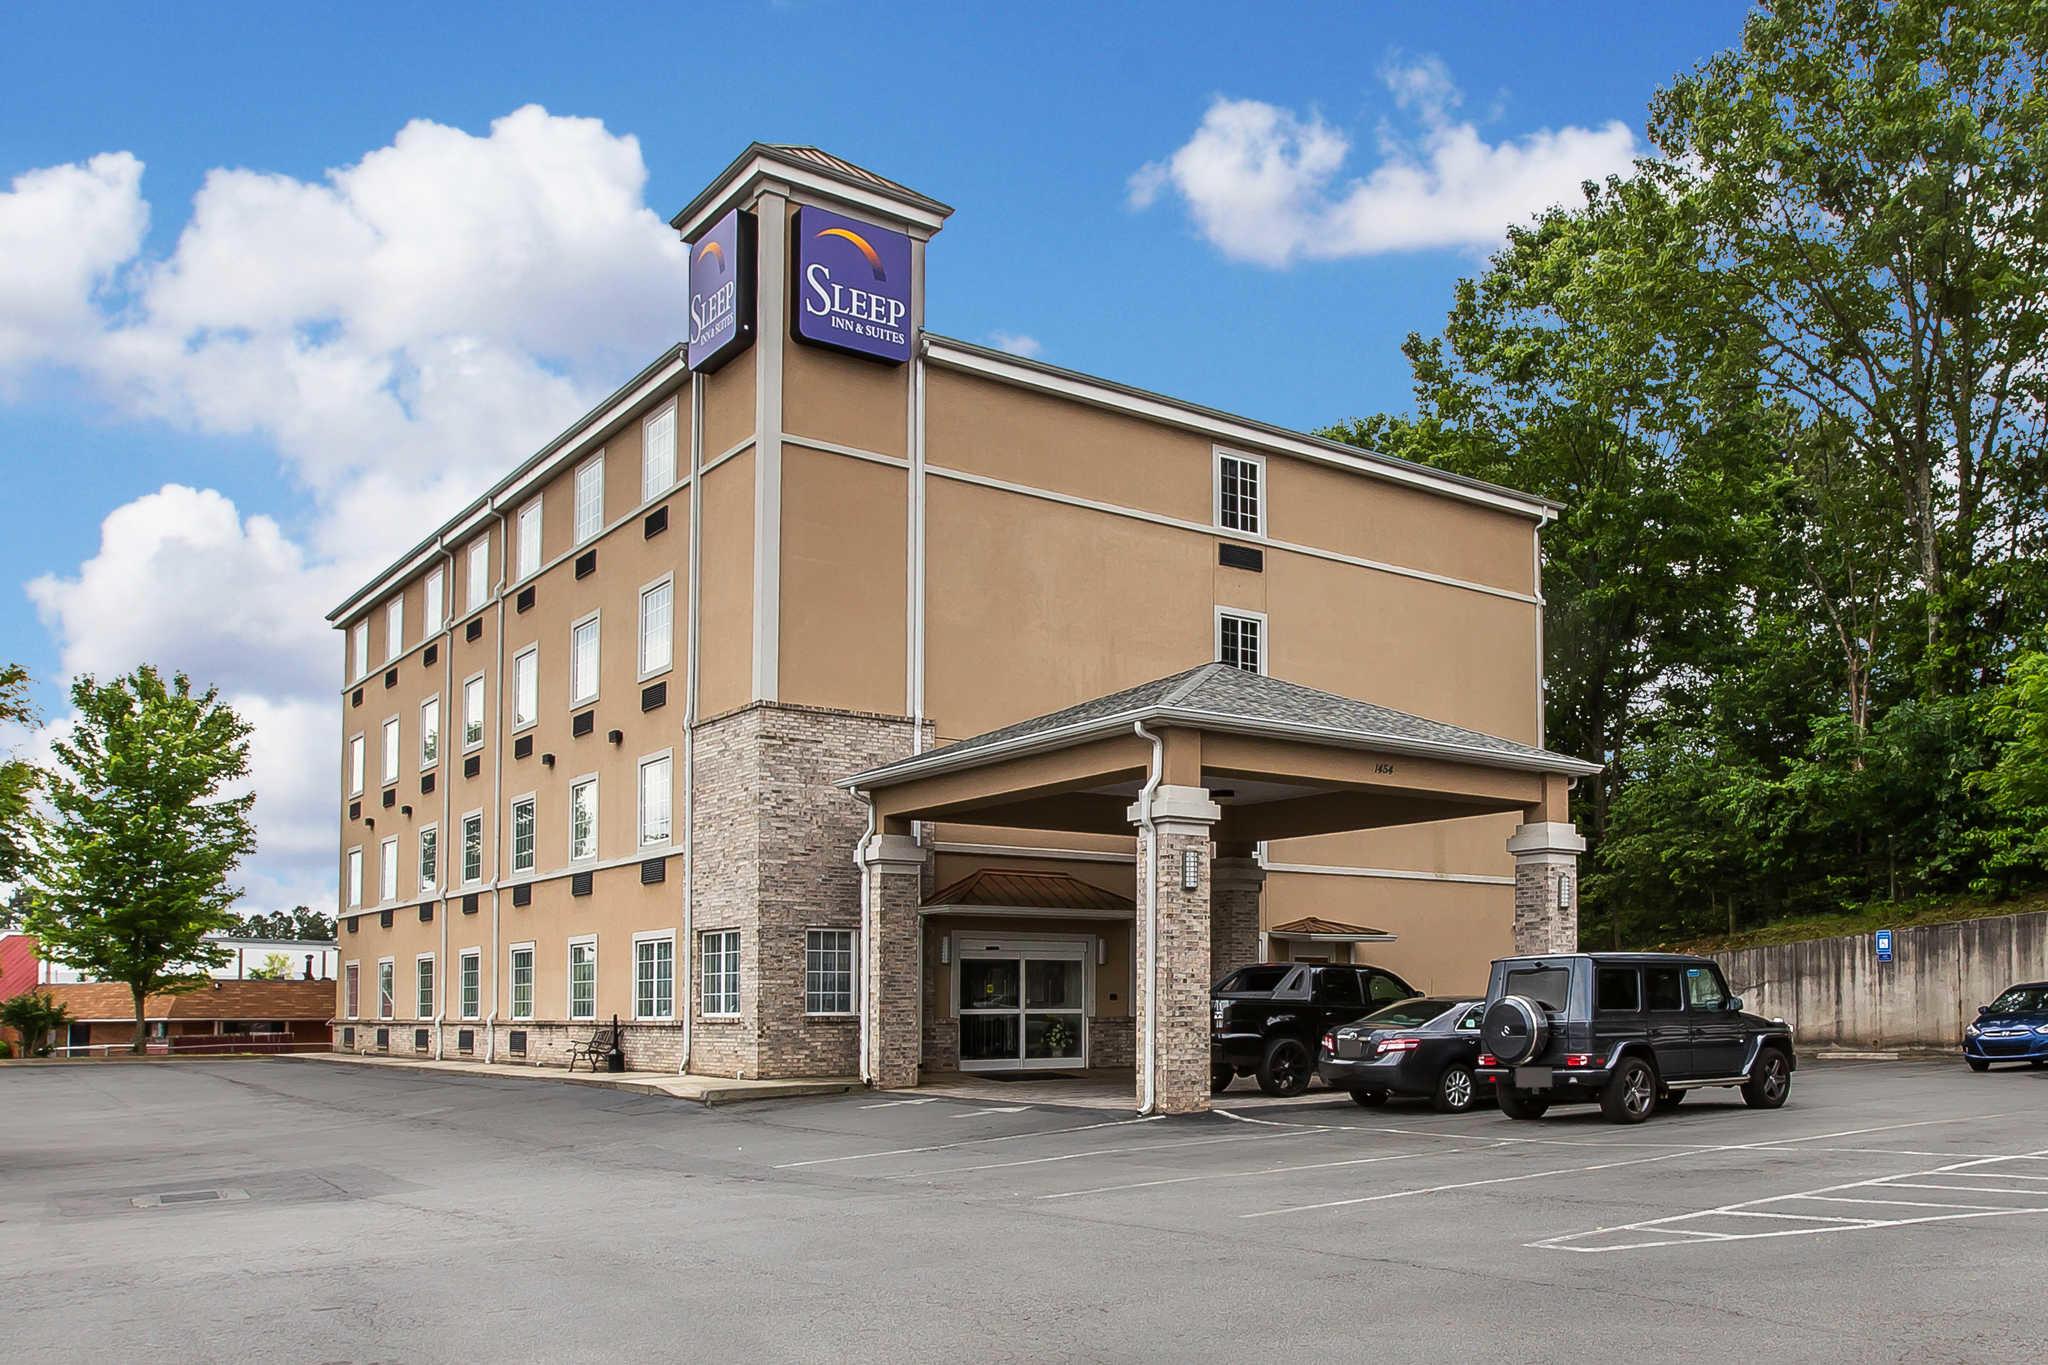 Sleep Inn & Suites At Kennesaw State University image 2